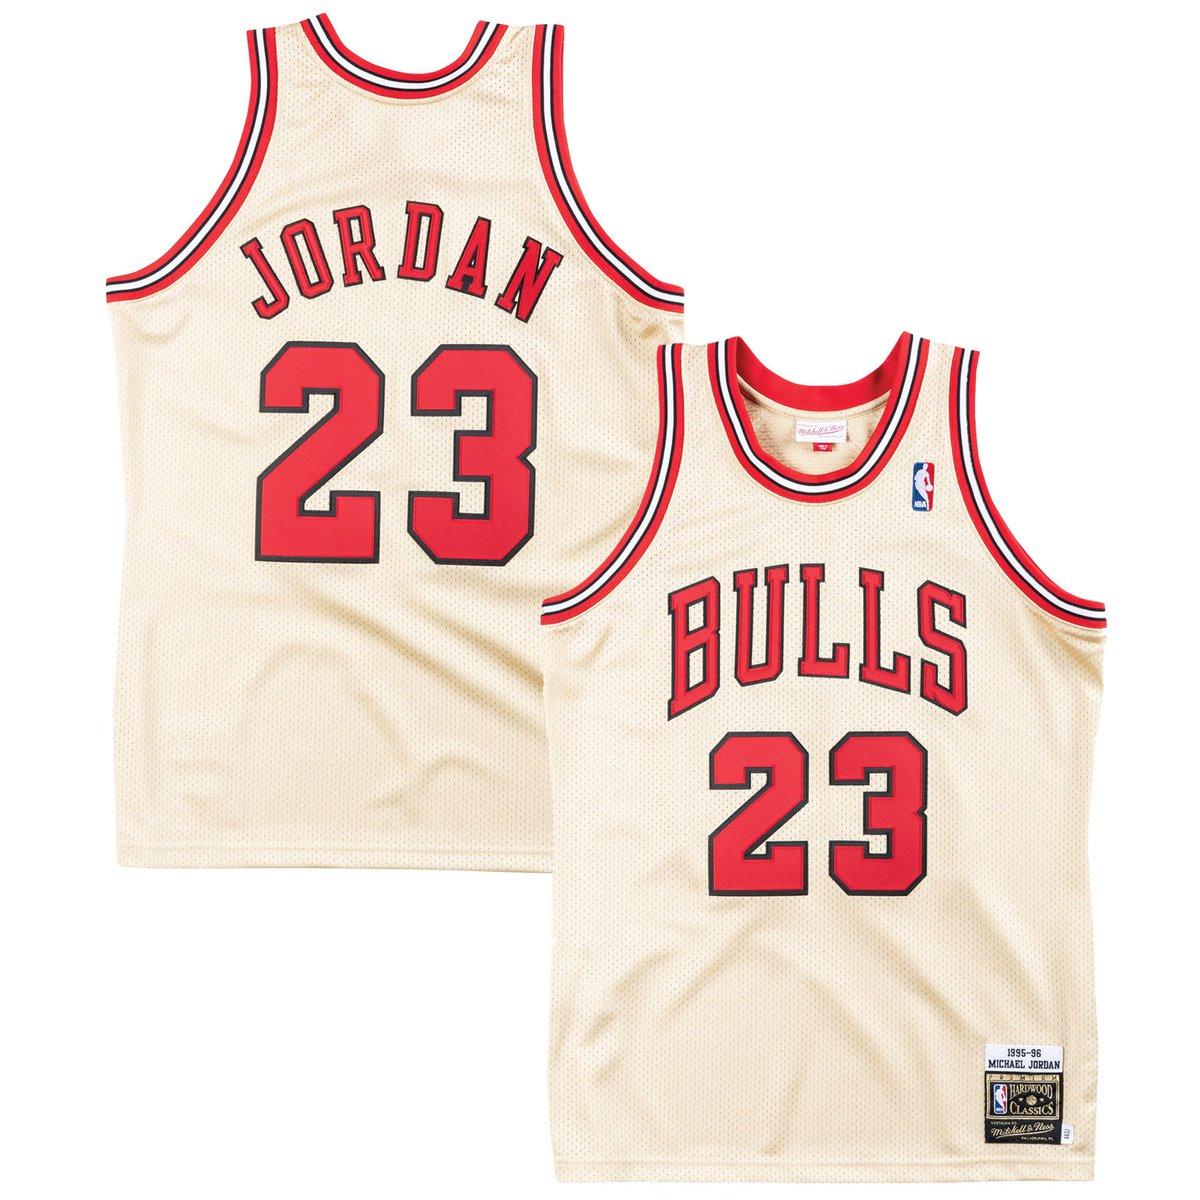 the best attitude 8f8e1 e7cc6 NBA Store on Twitter: